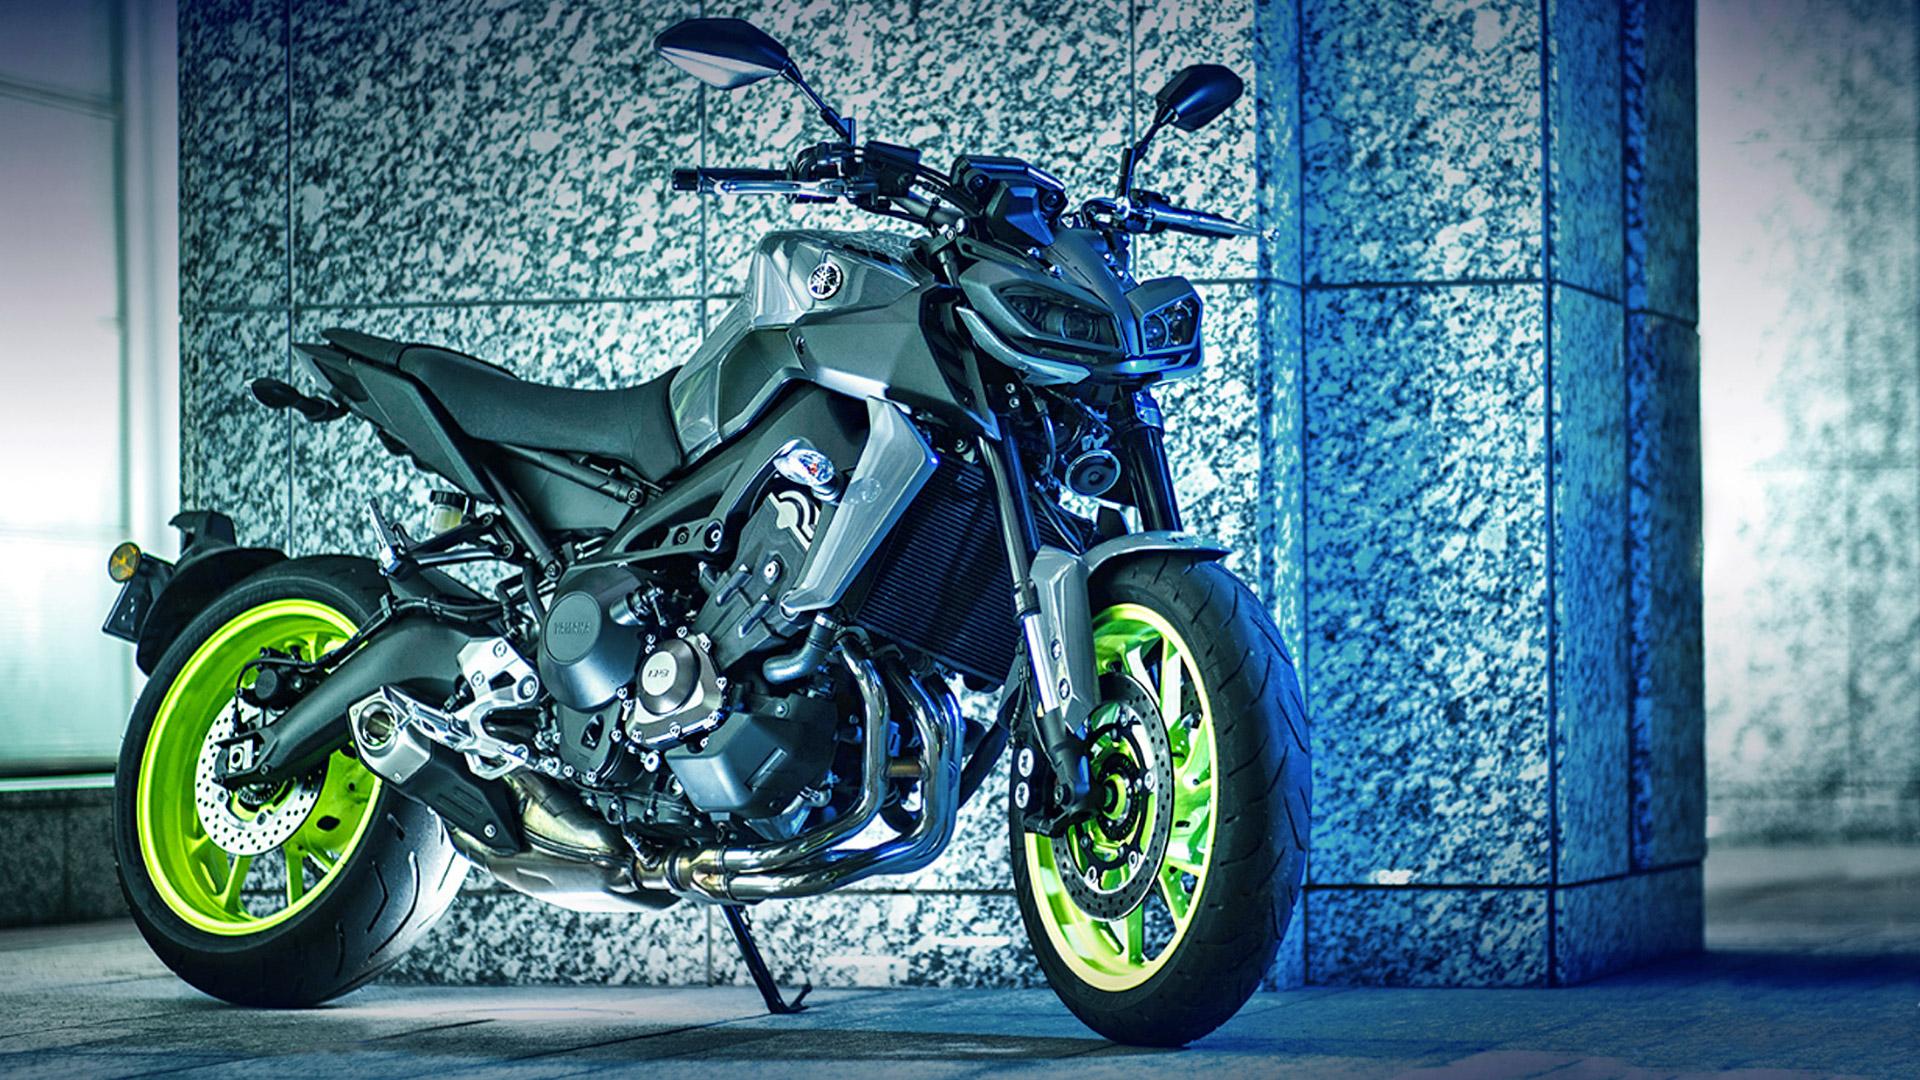 Yamaha MT-09 2017 STD